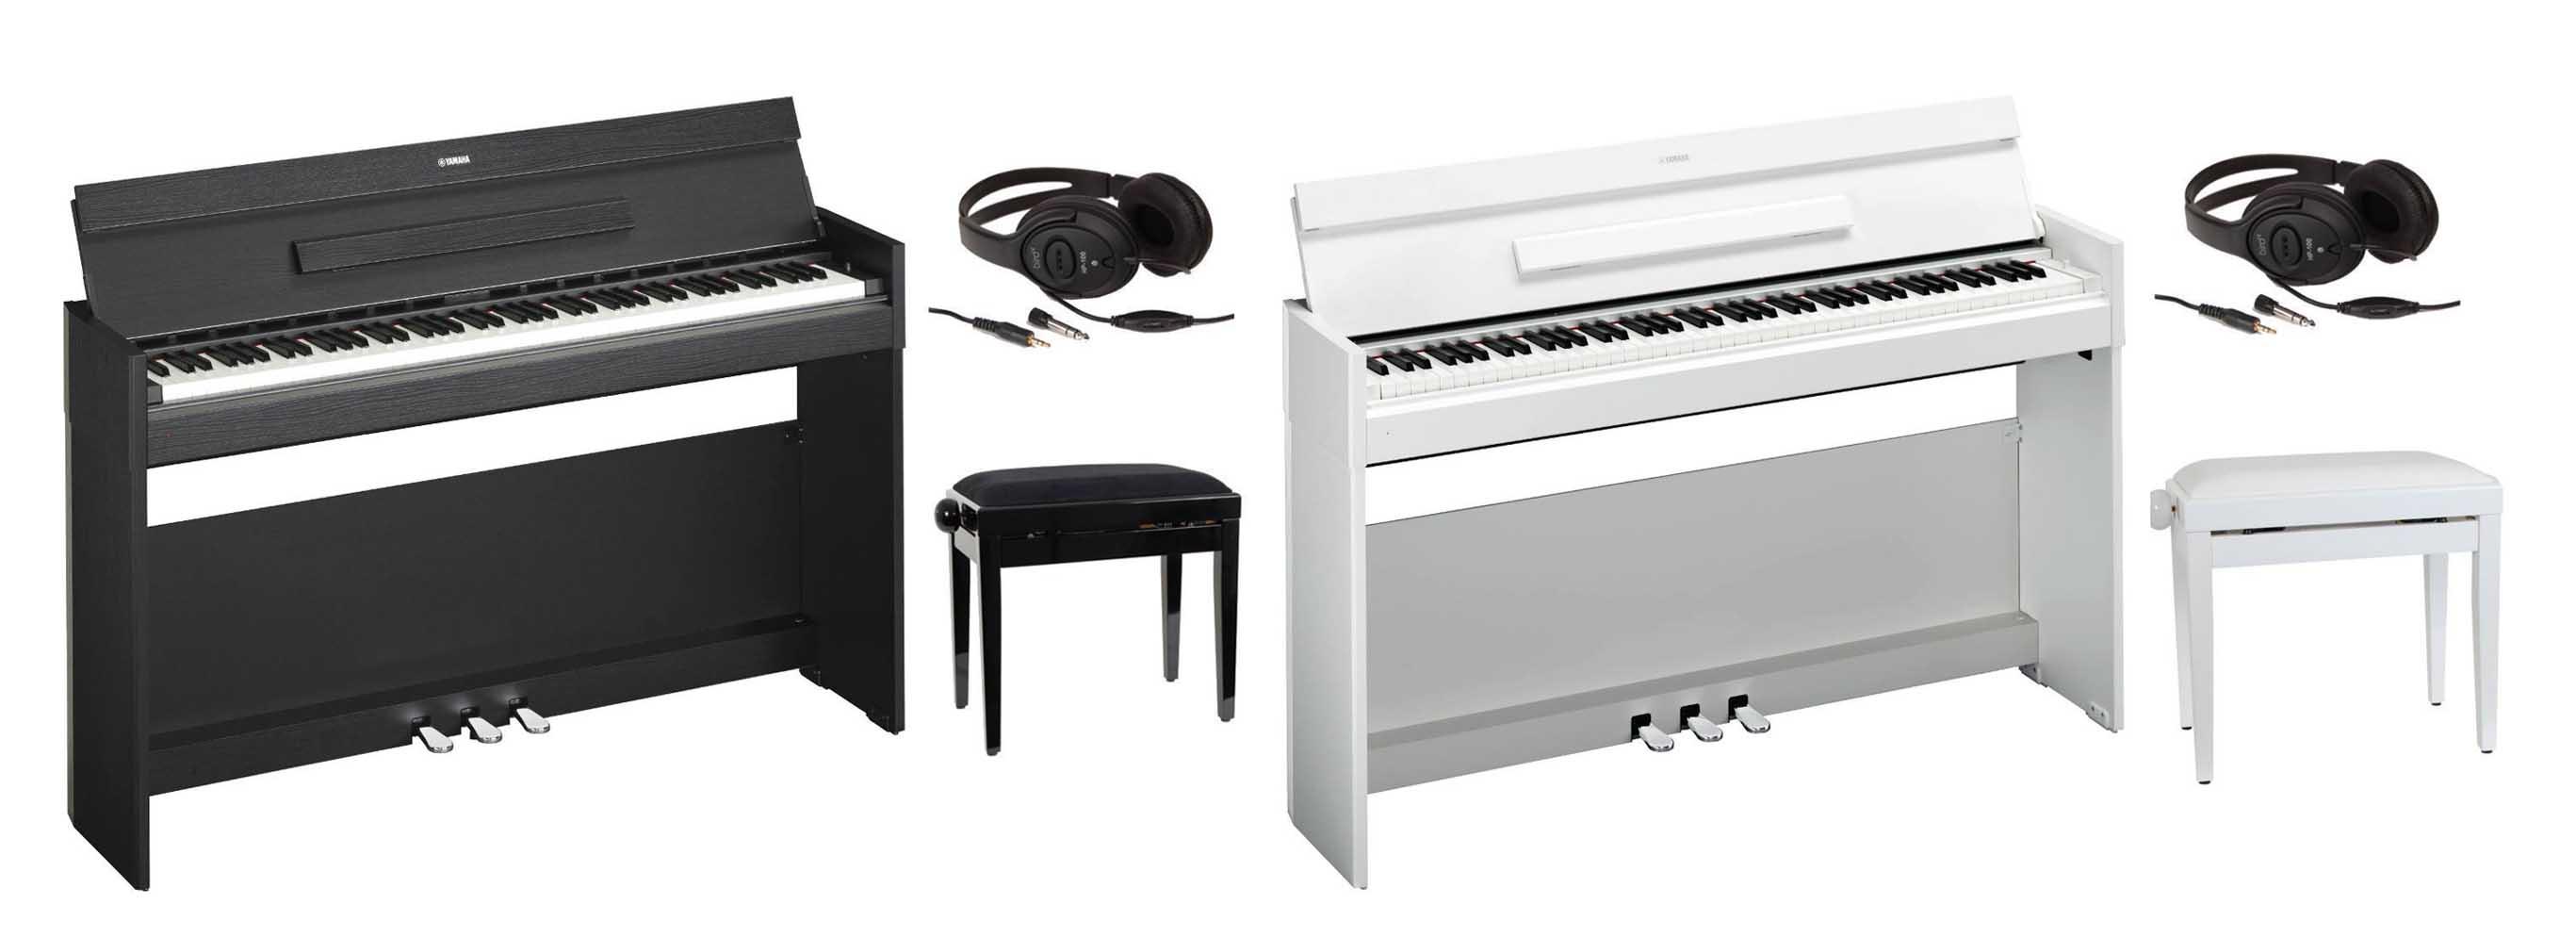 pianos digitales yamaha arius tu primer gran piano digital. Black Bedroom Furniture Sets. Home Design Ideas